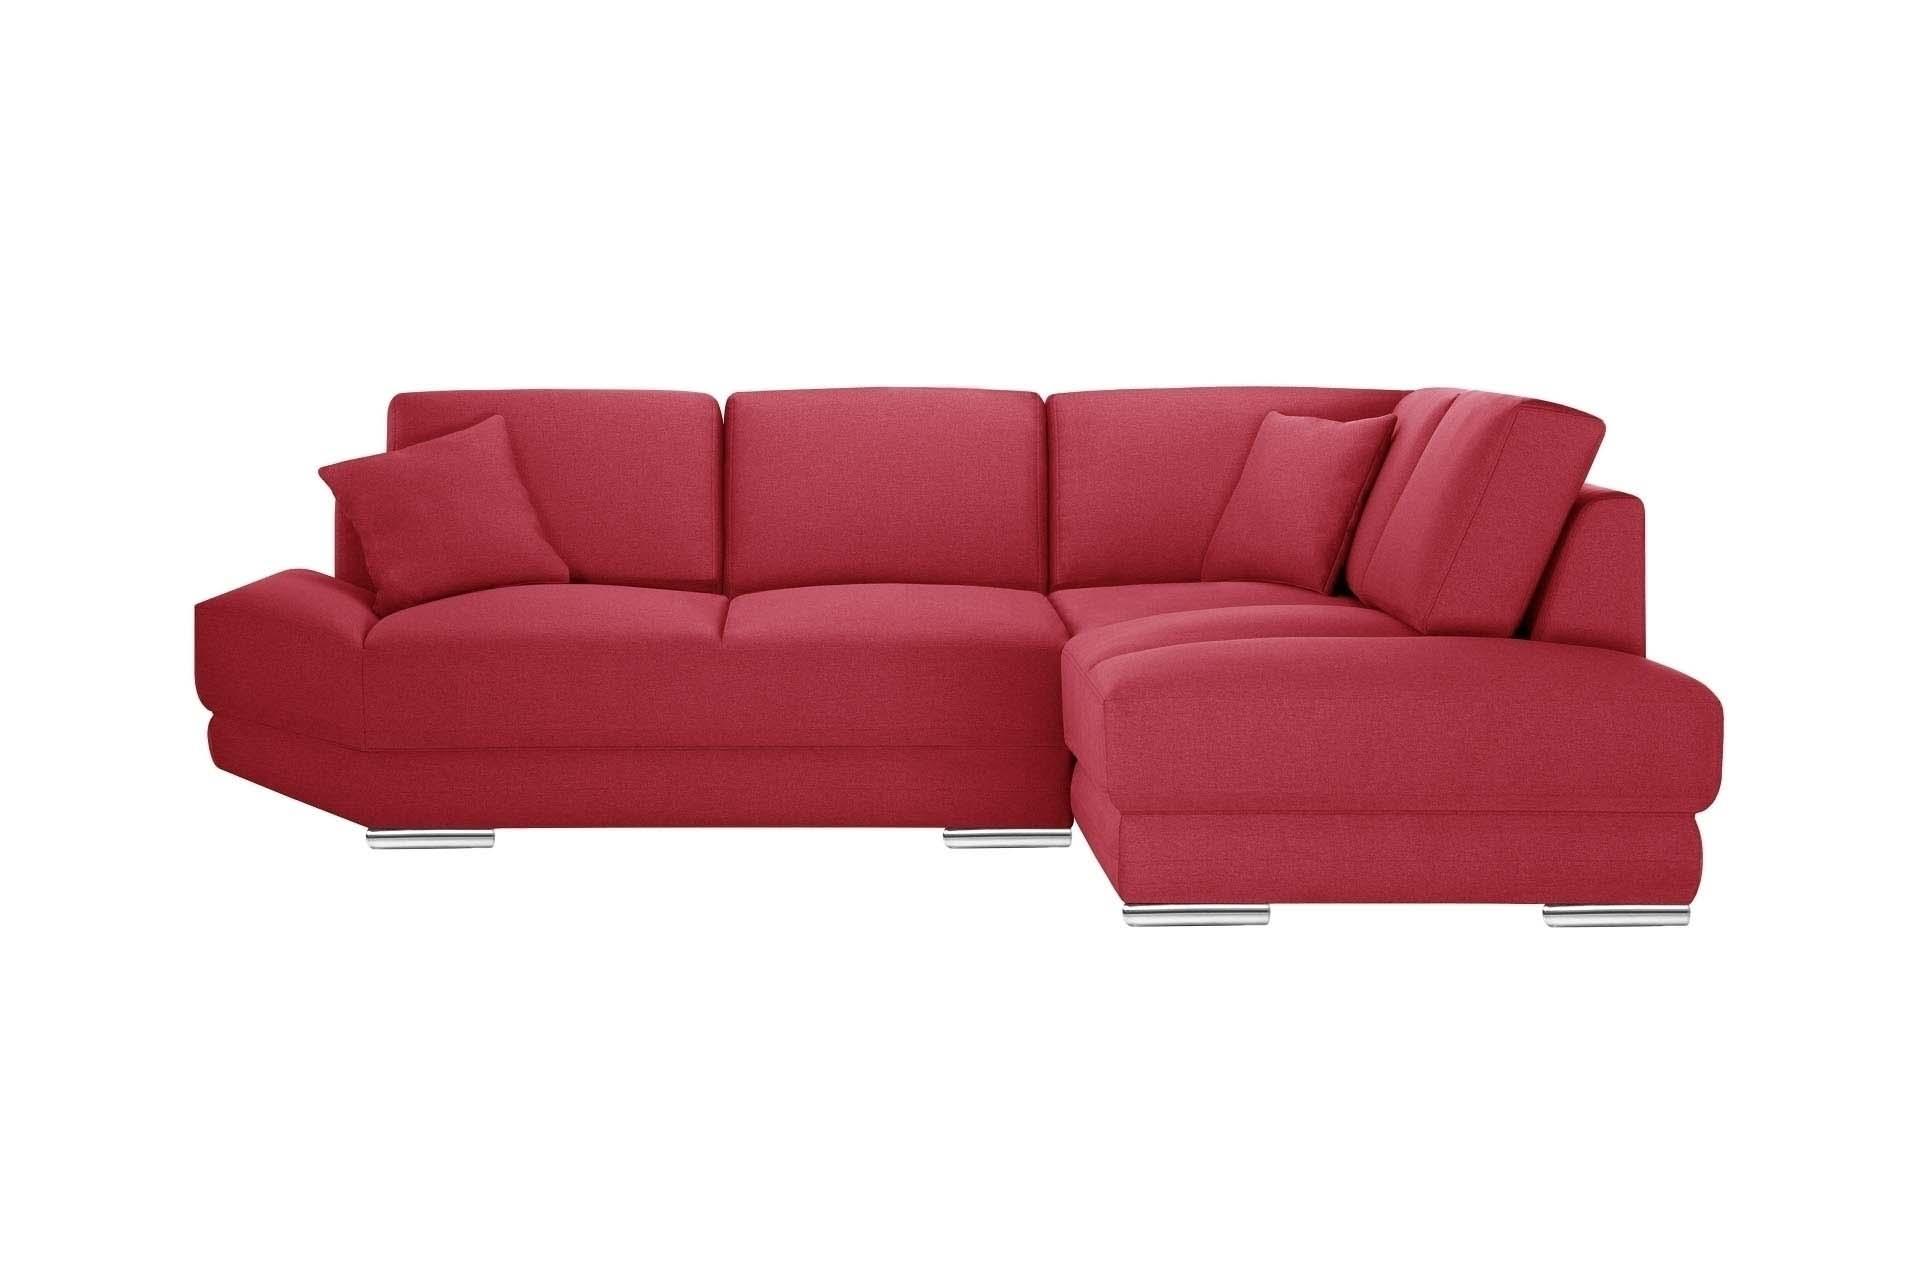 Canapé d'angle 5 places Rouge Tissu